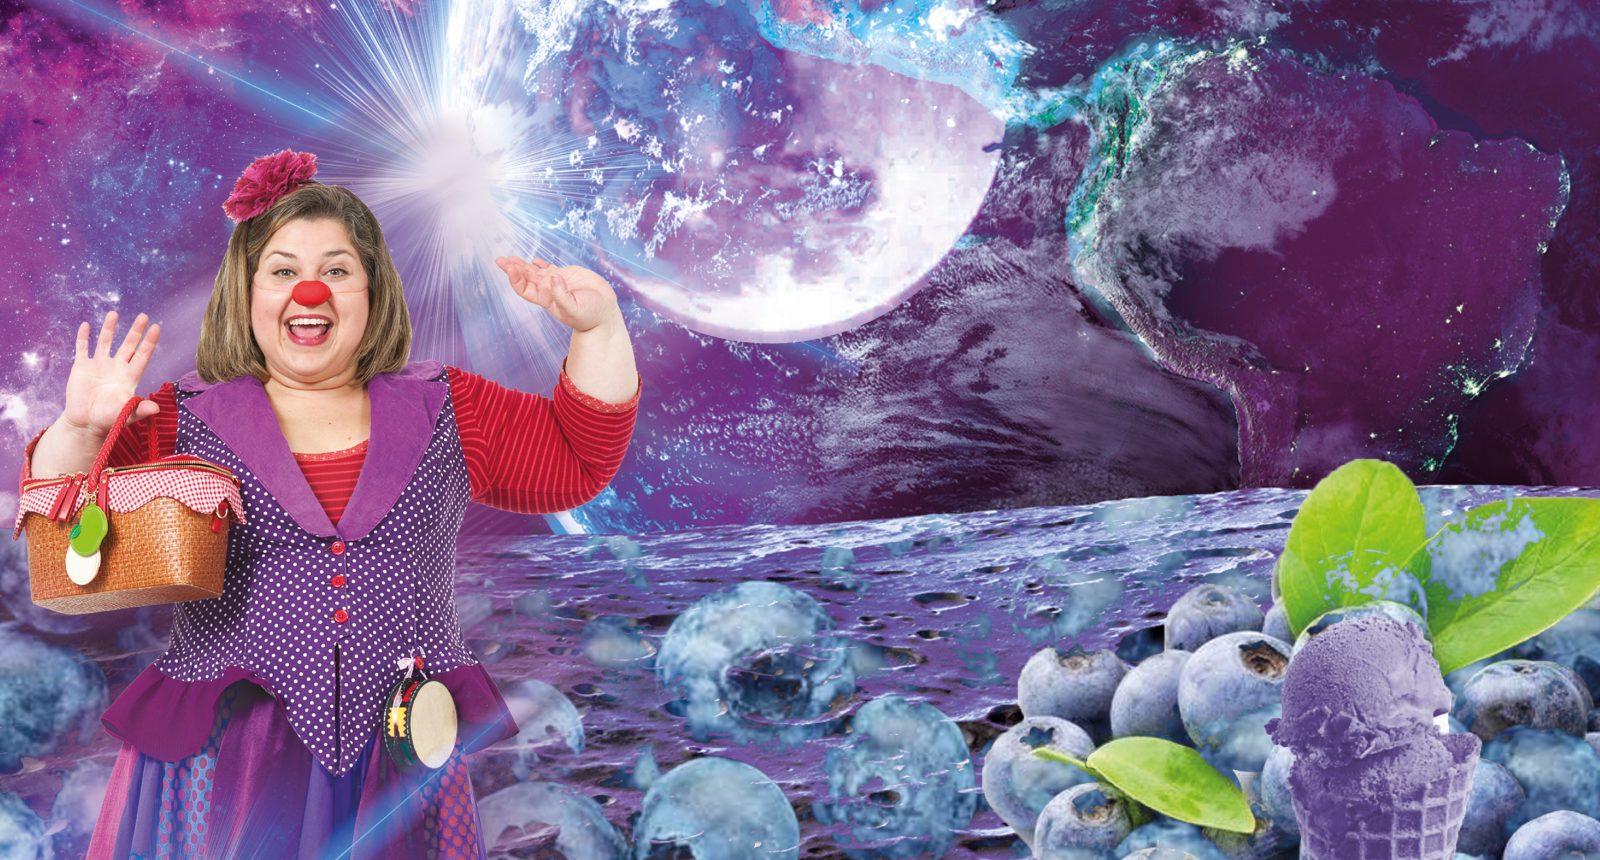 Lilla Bollilla og blåbærmånen